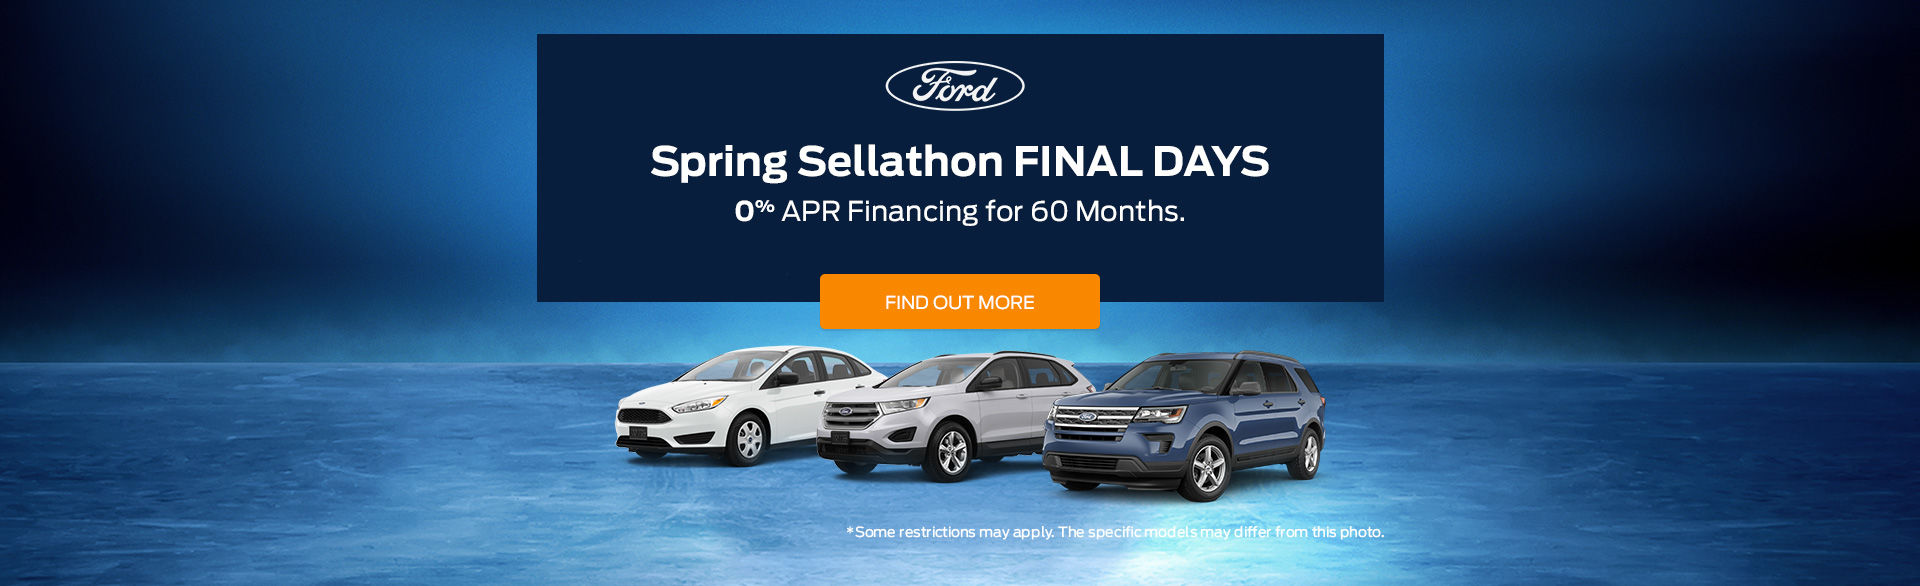 Spring Sellathon FINAL DAYS